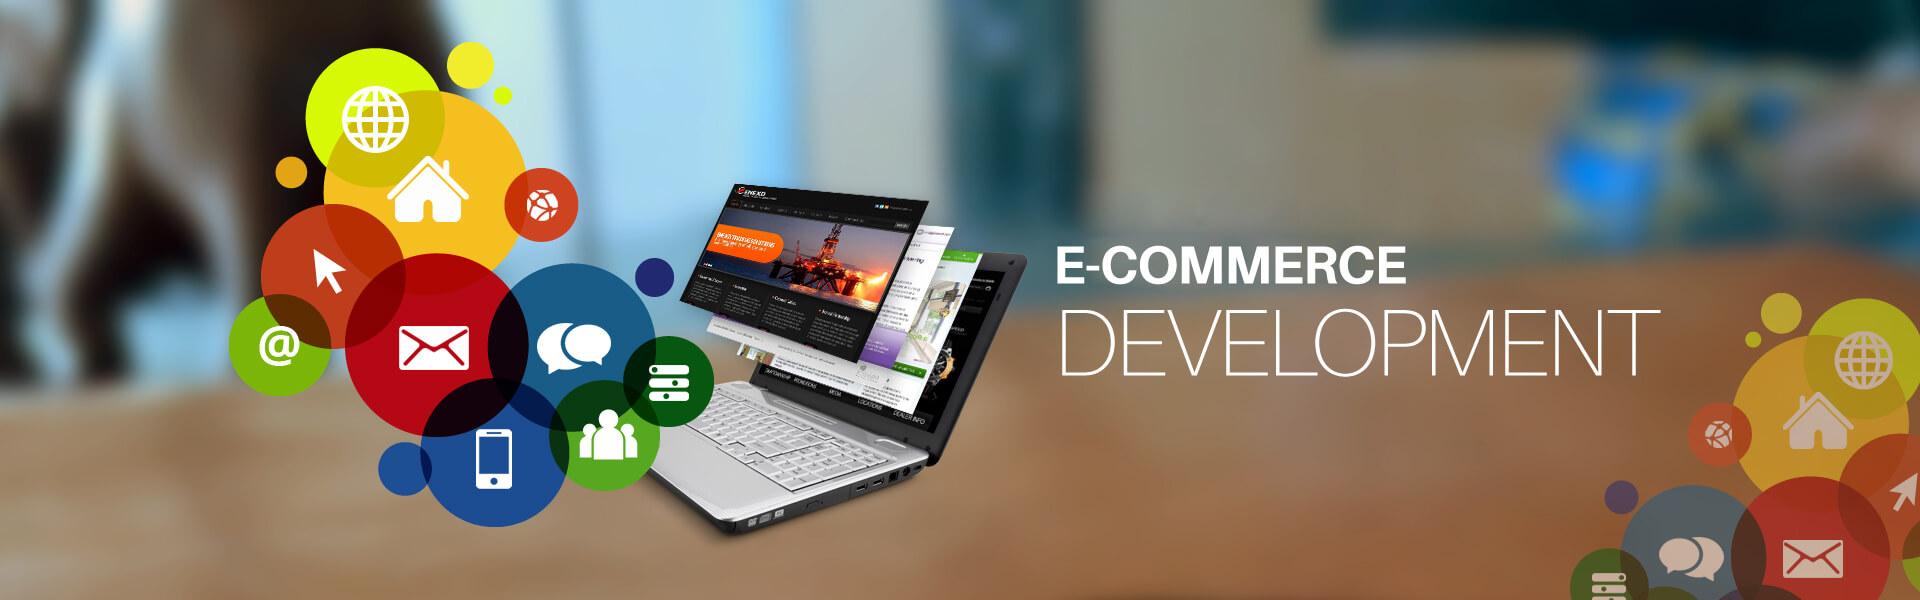 ecommerce-portal